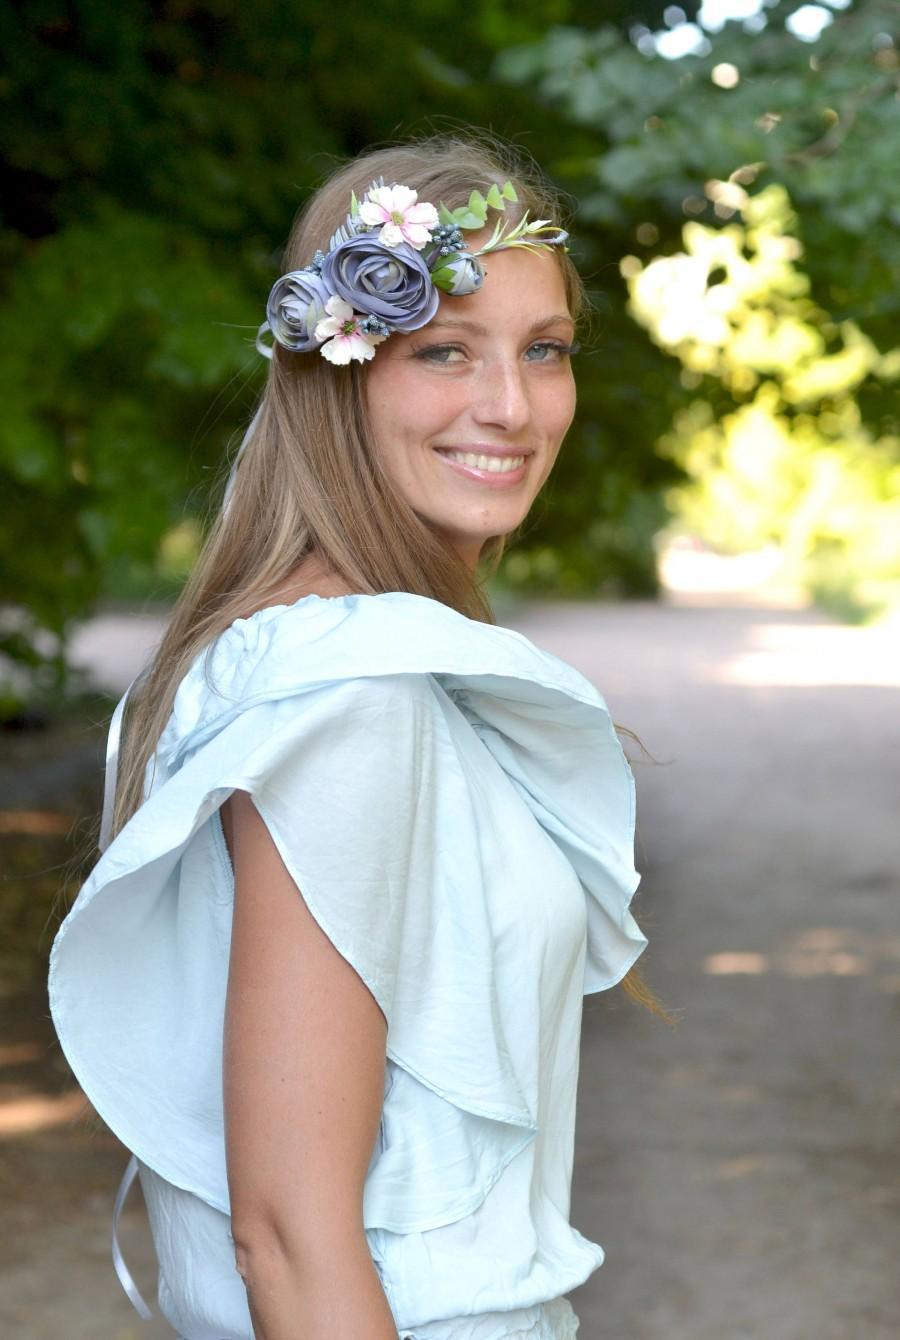 Mariage - Serenity flower crown wedding ash blue floral headband bridal flowers head wreath Serenity hair dress floral crown Ready to ship - $35.00 USD